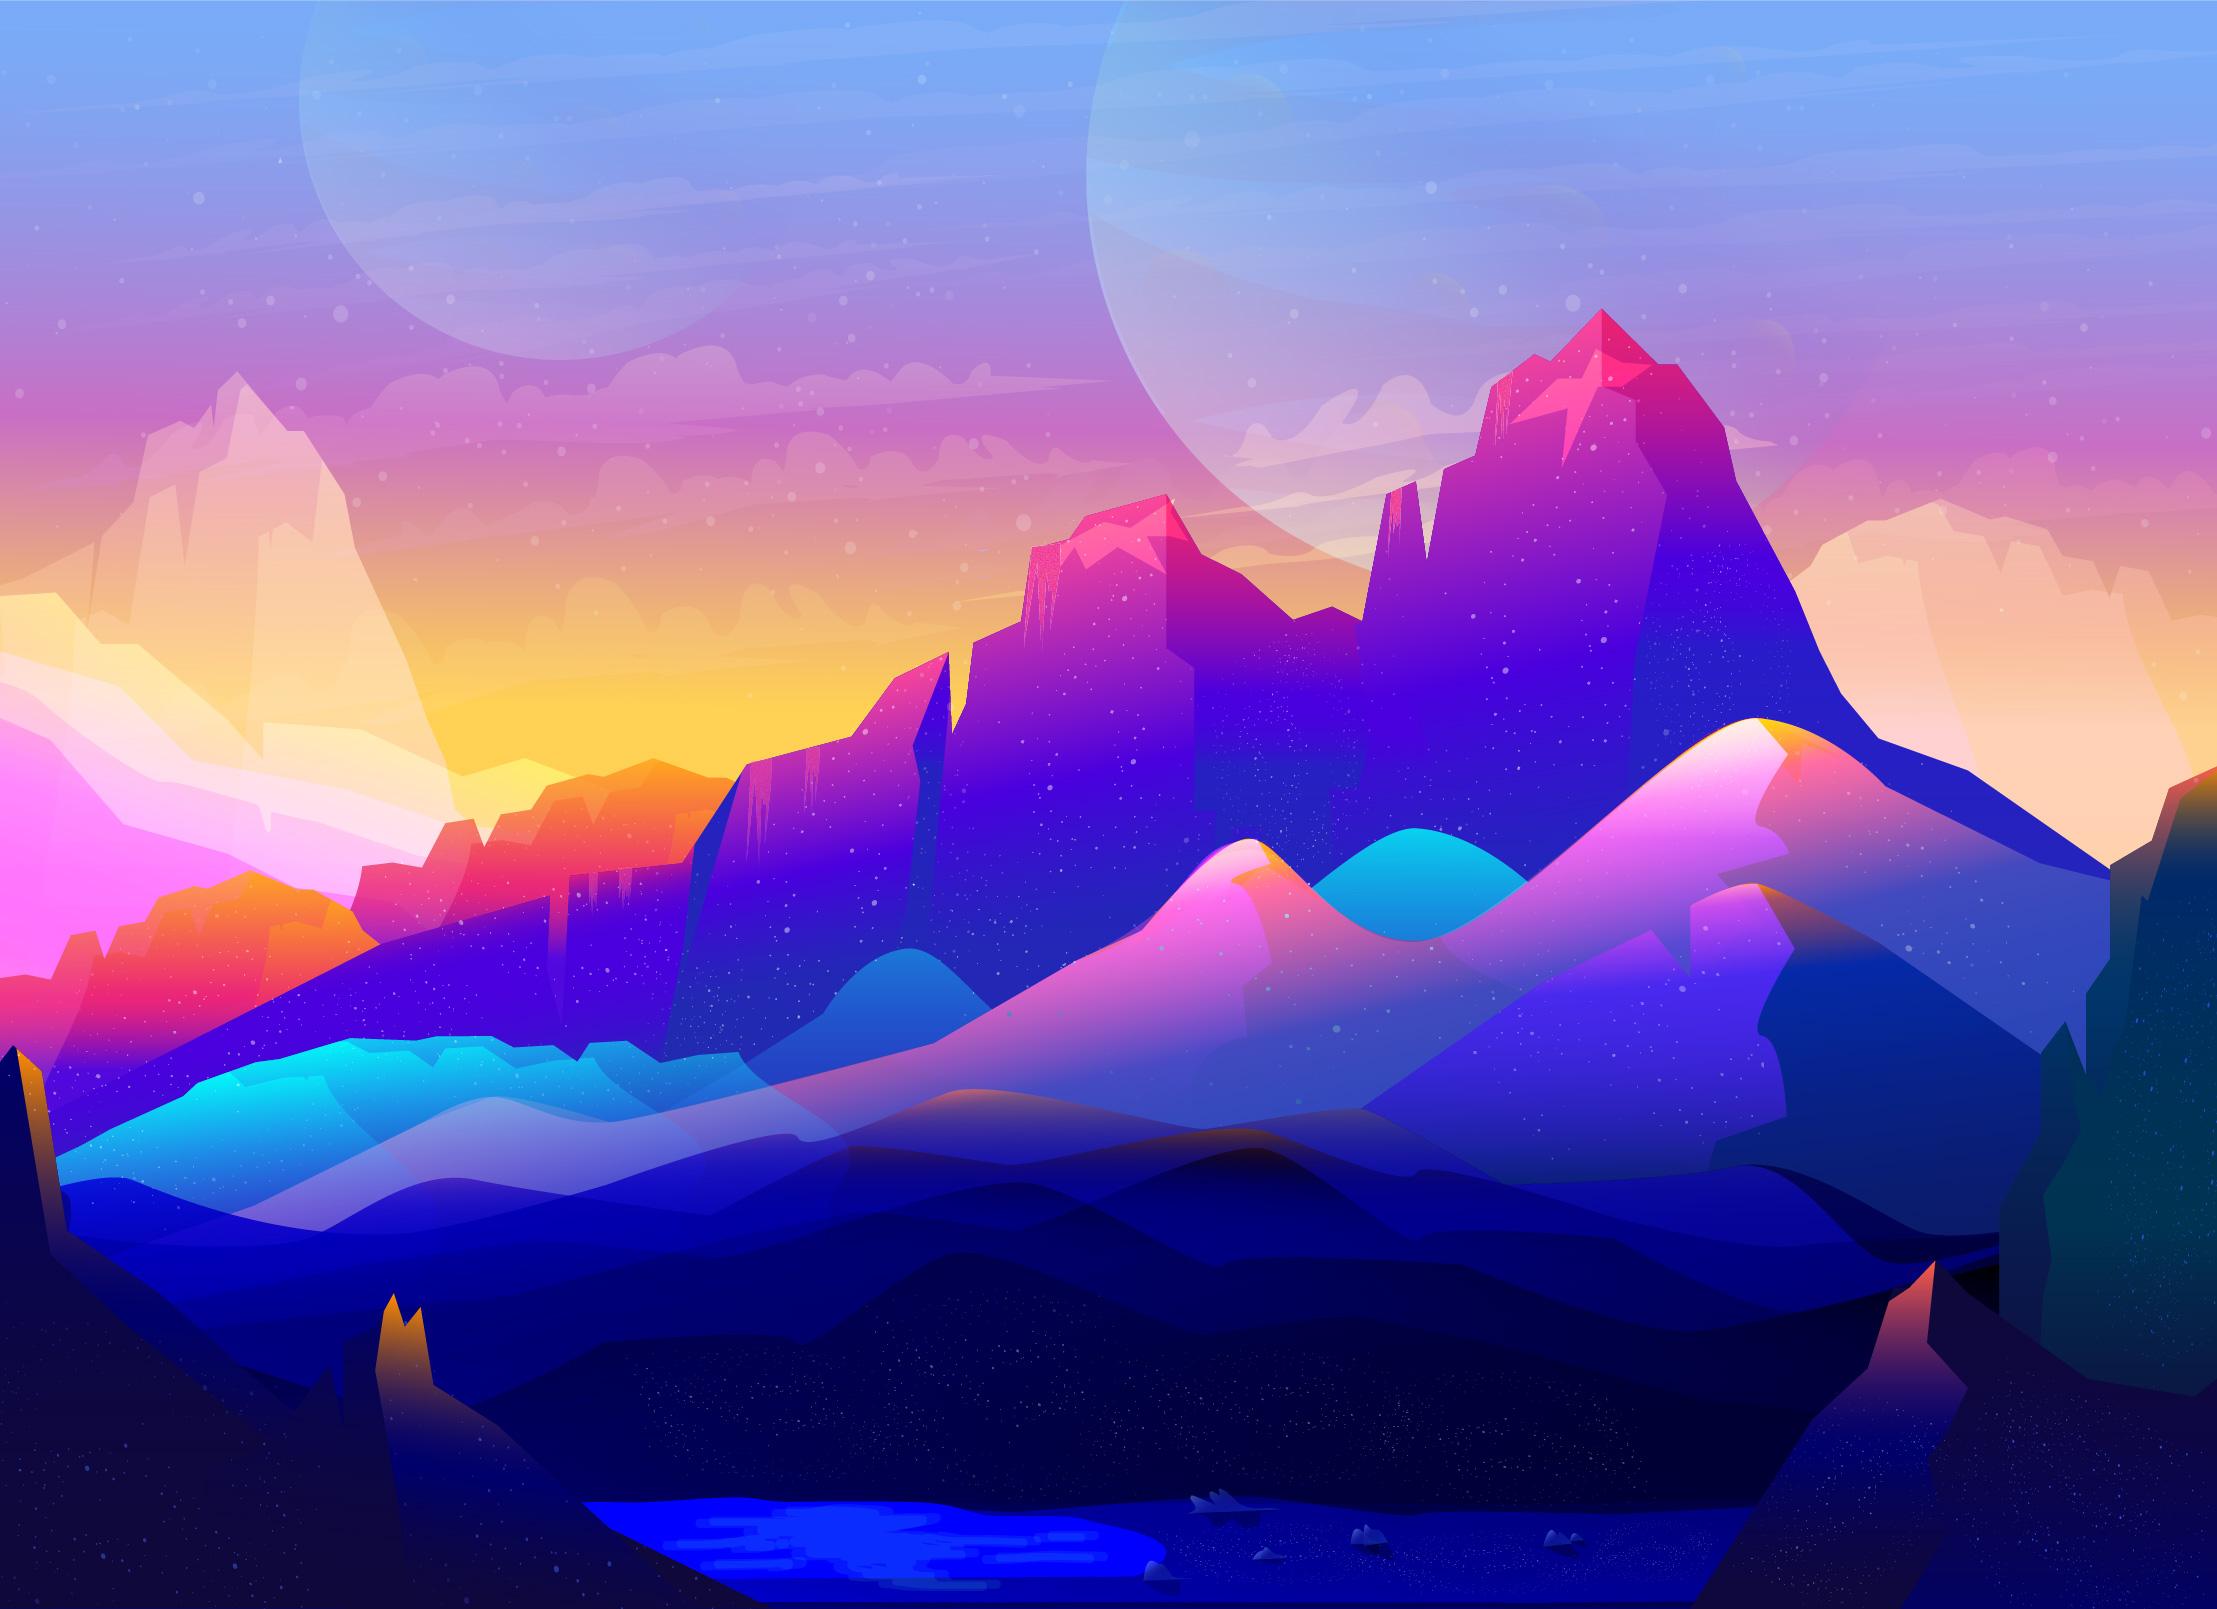 Rock Mountains Landscape Colorful Illustration Minimalist